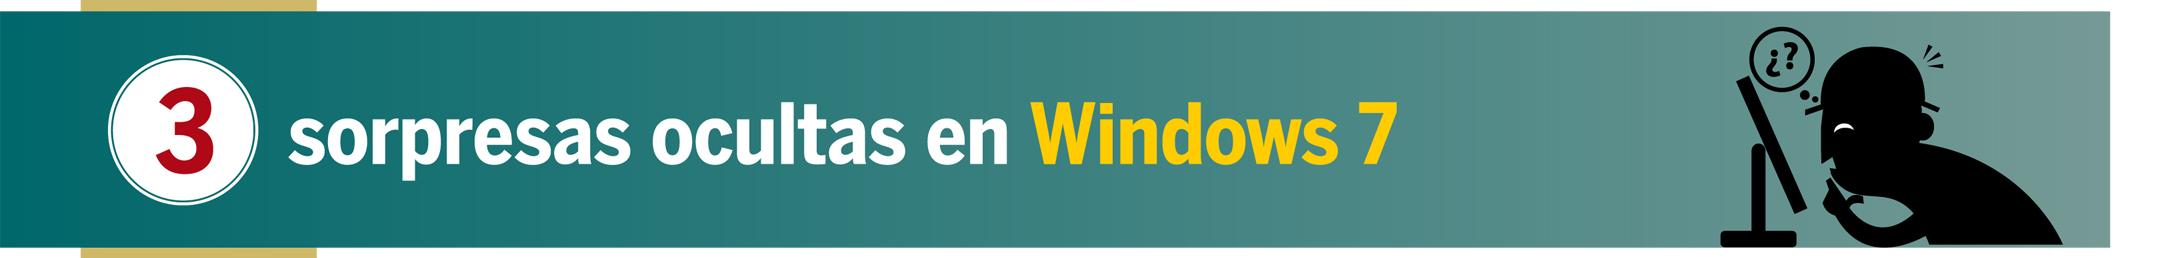 Windows 7: 3 trucos secretos